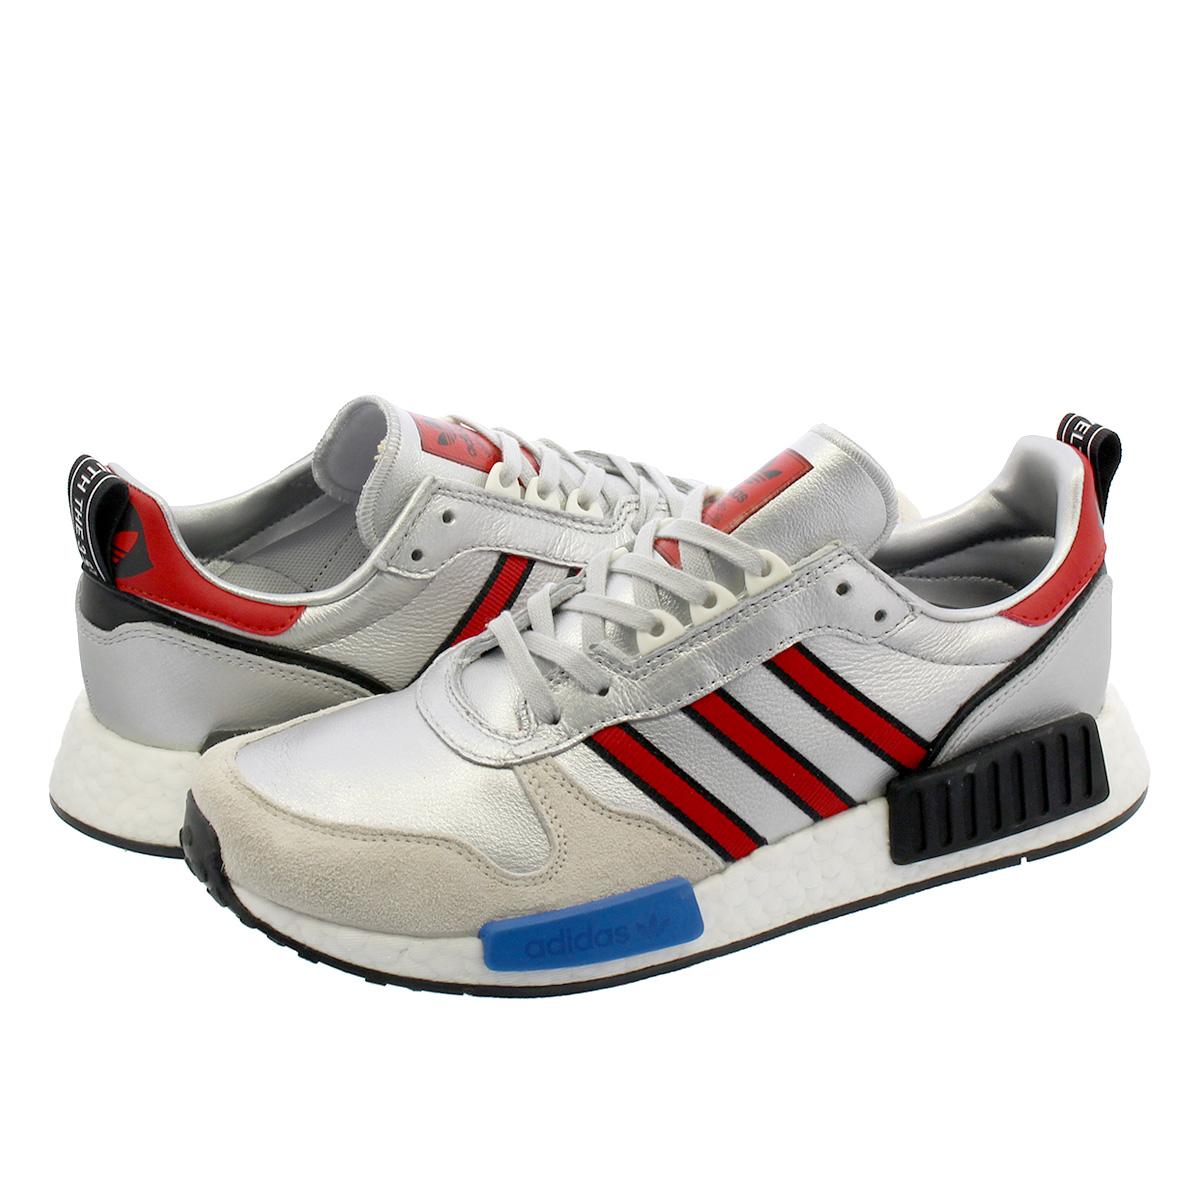 separation shoes 7f98f c37b7 adidas RISINGSTAR x R1 Adidas rising star x R1 SILVER MET/COLLEGE  RED/RUNNING WHITE